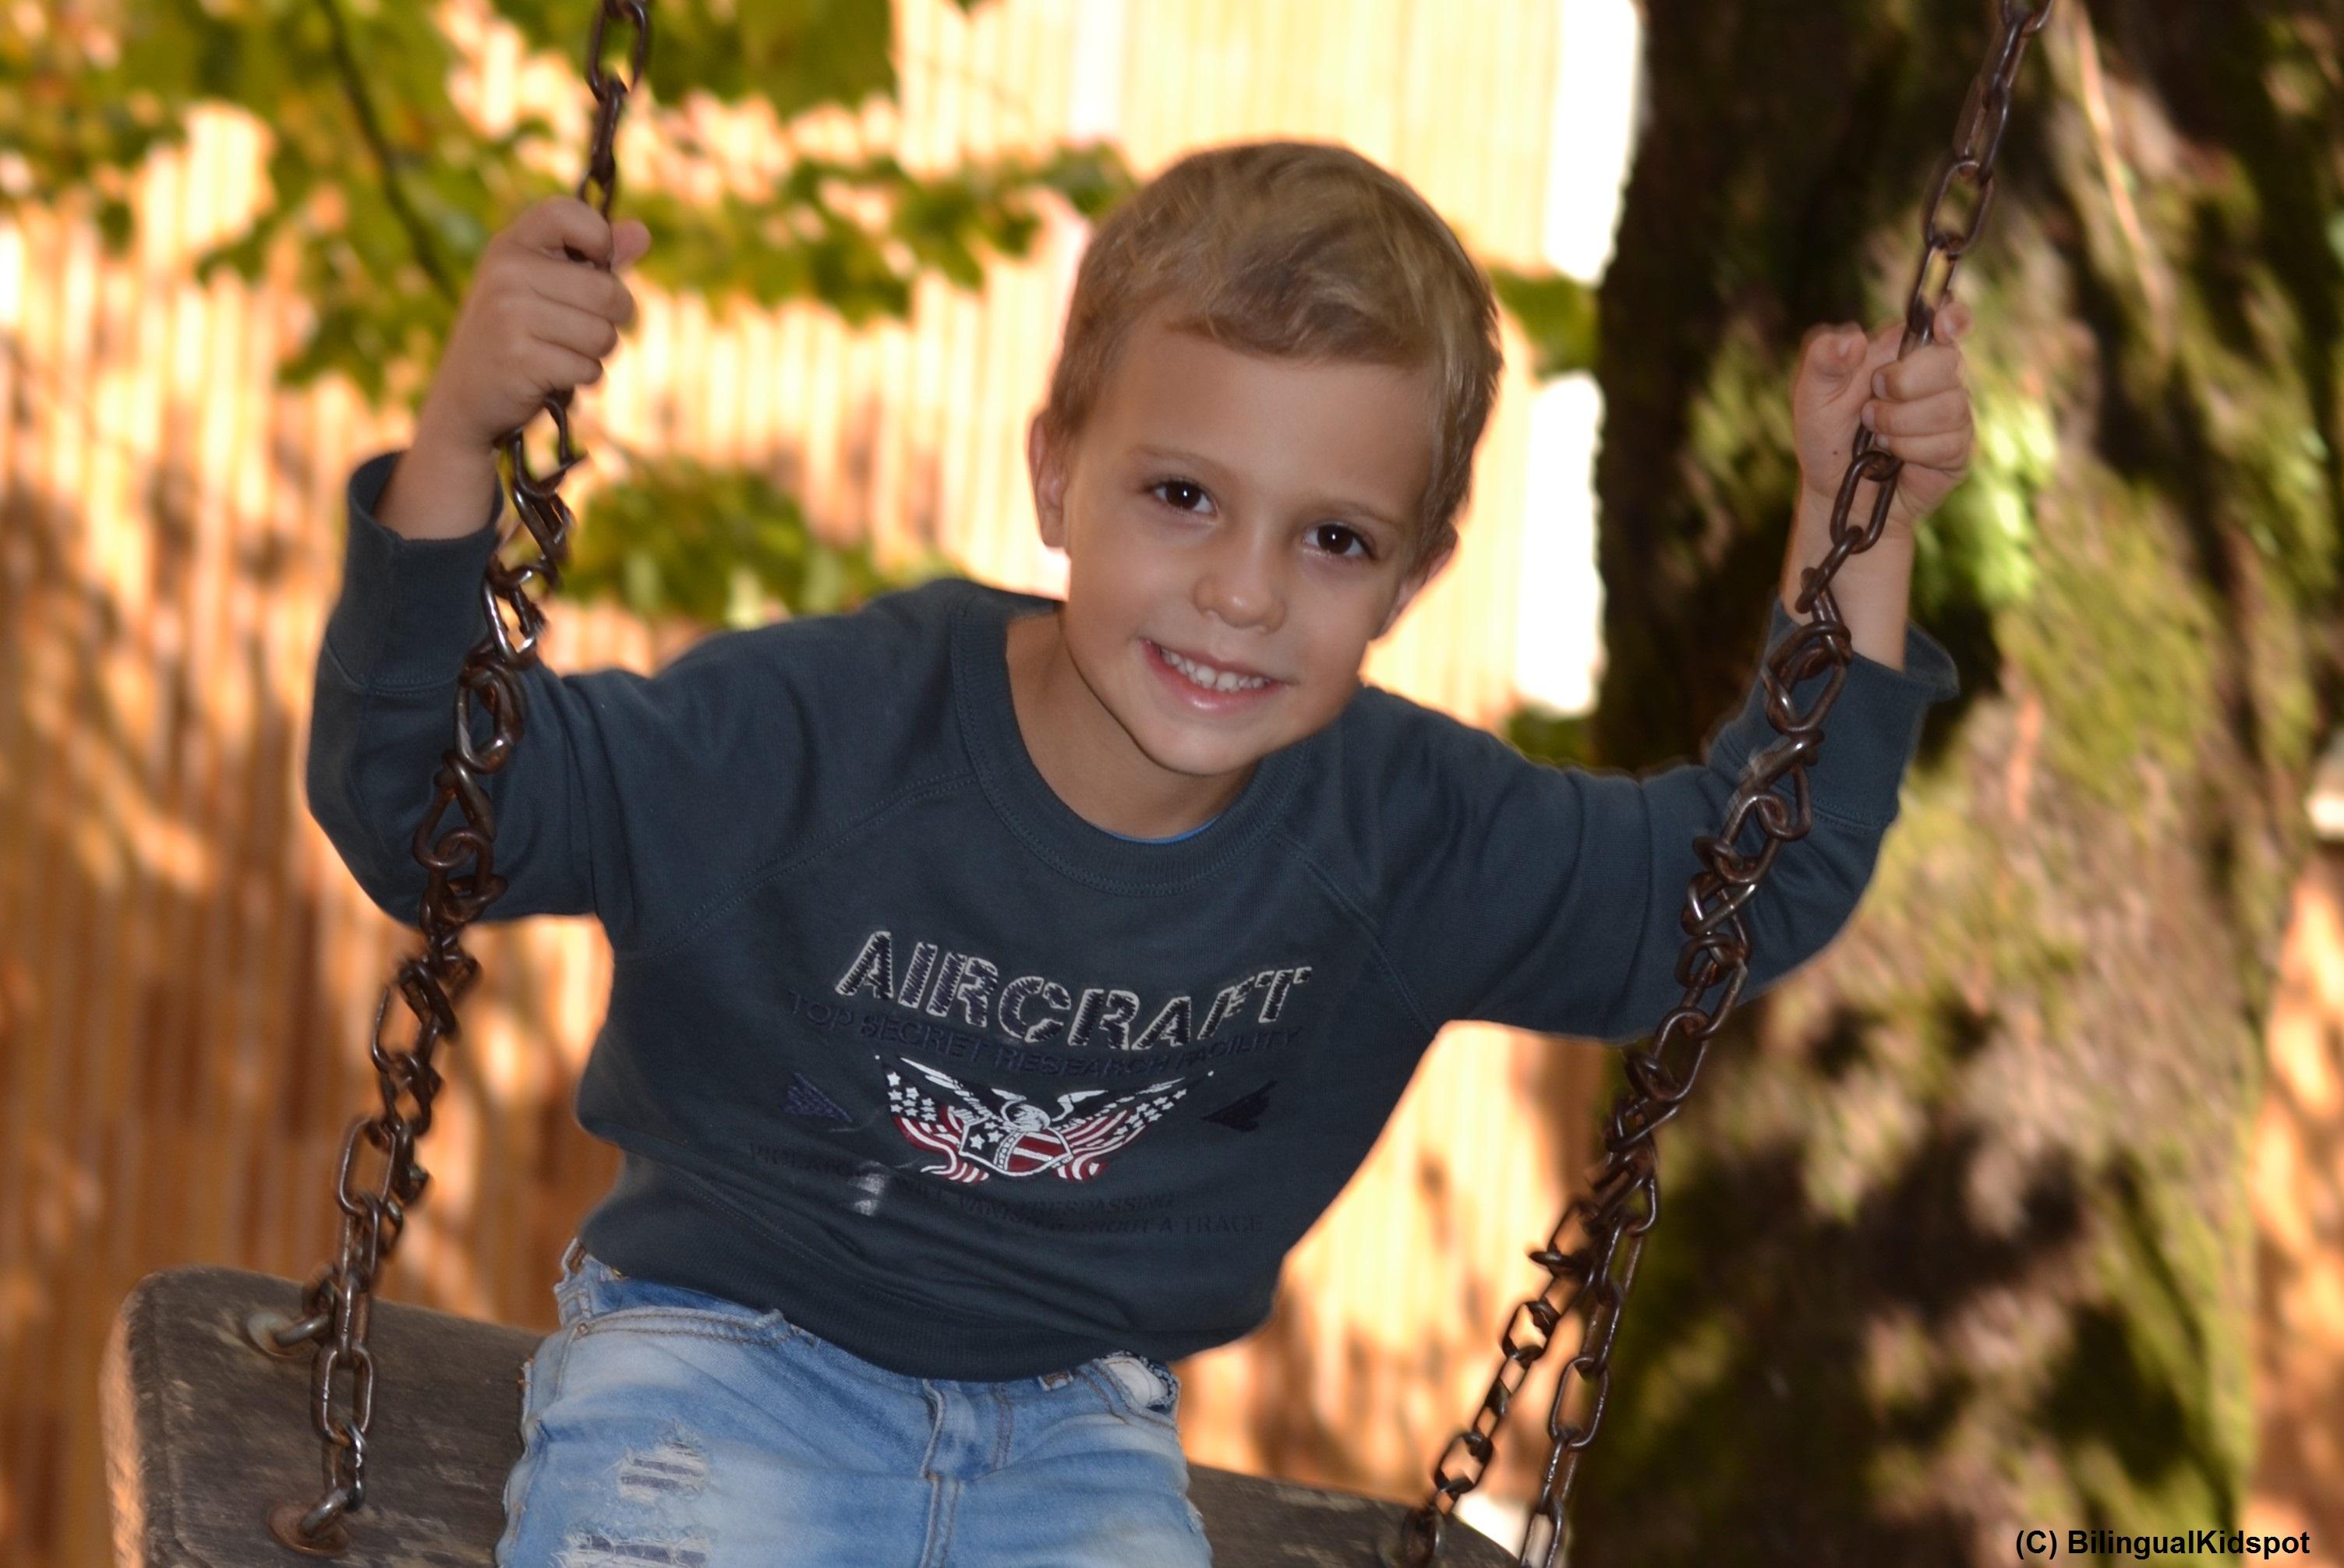 10 Amazing Benefits of Being Bilingual | Bilingual Kidspot